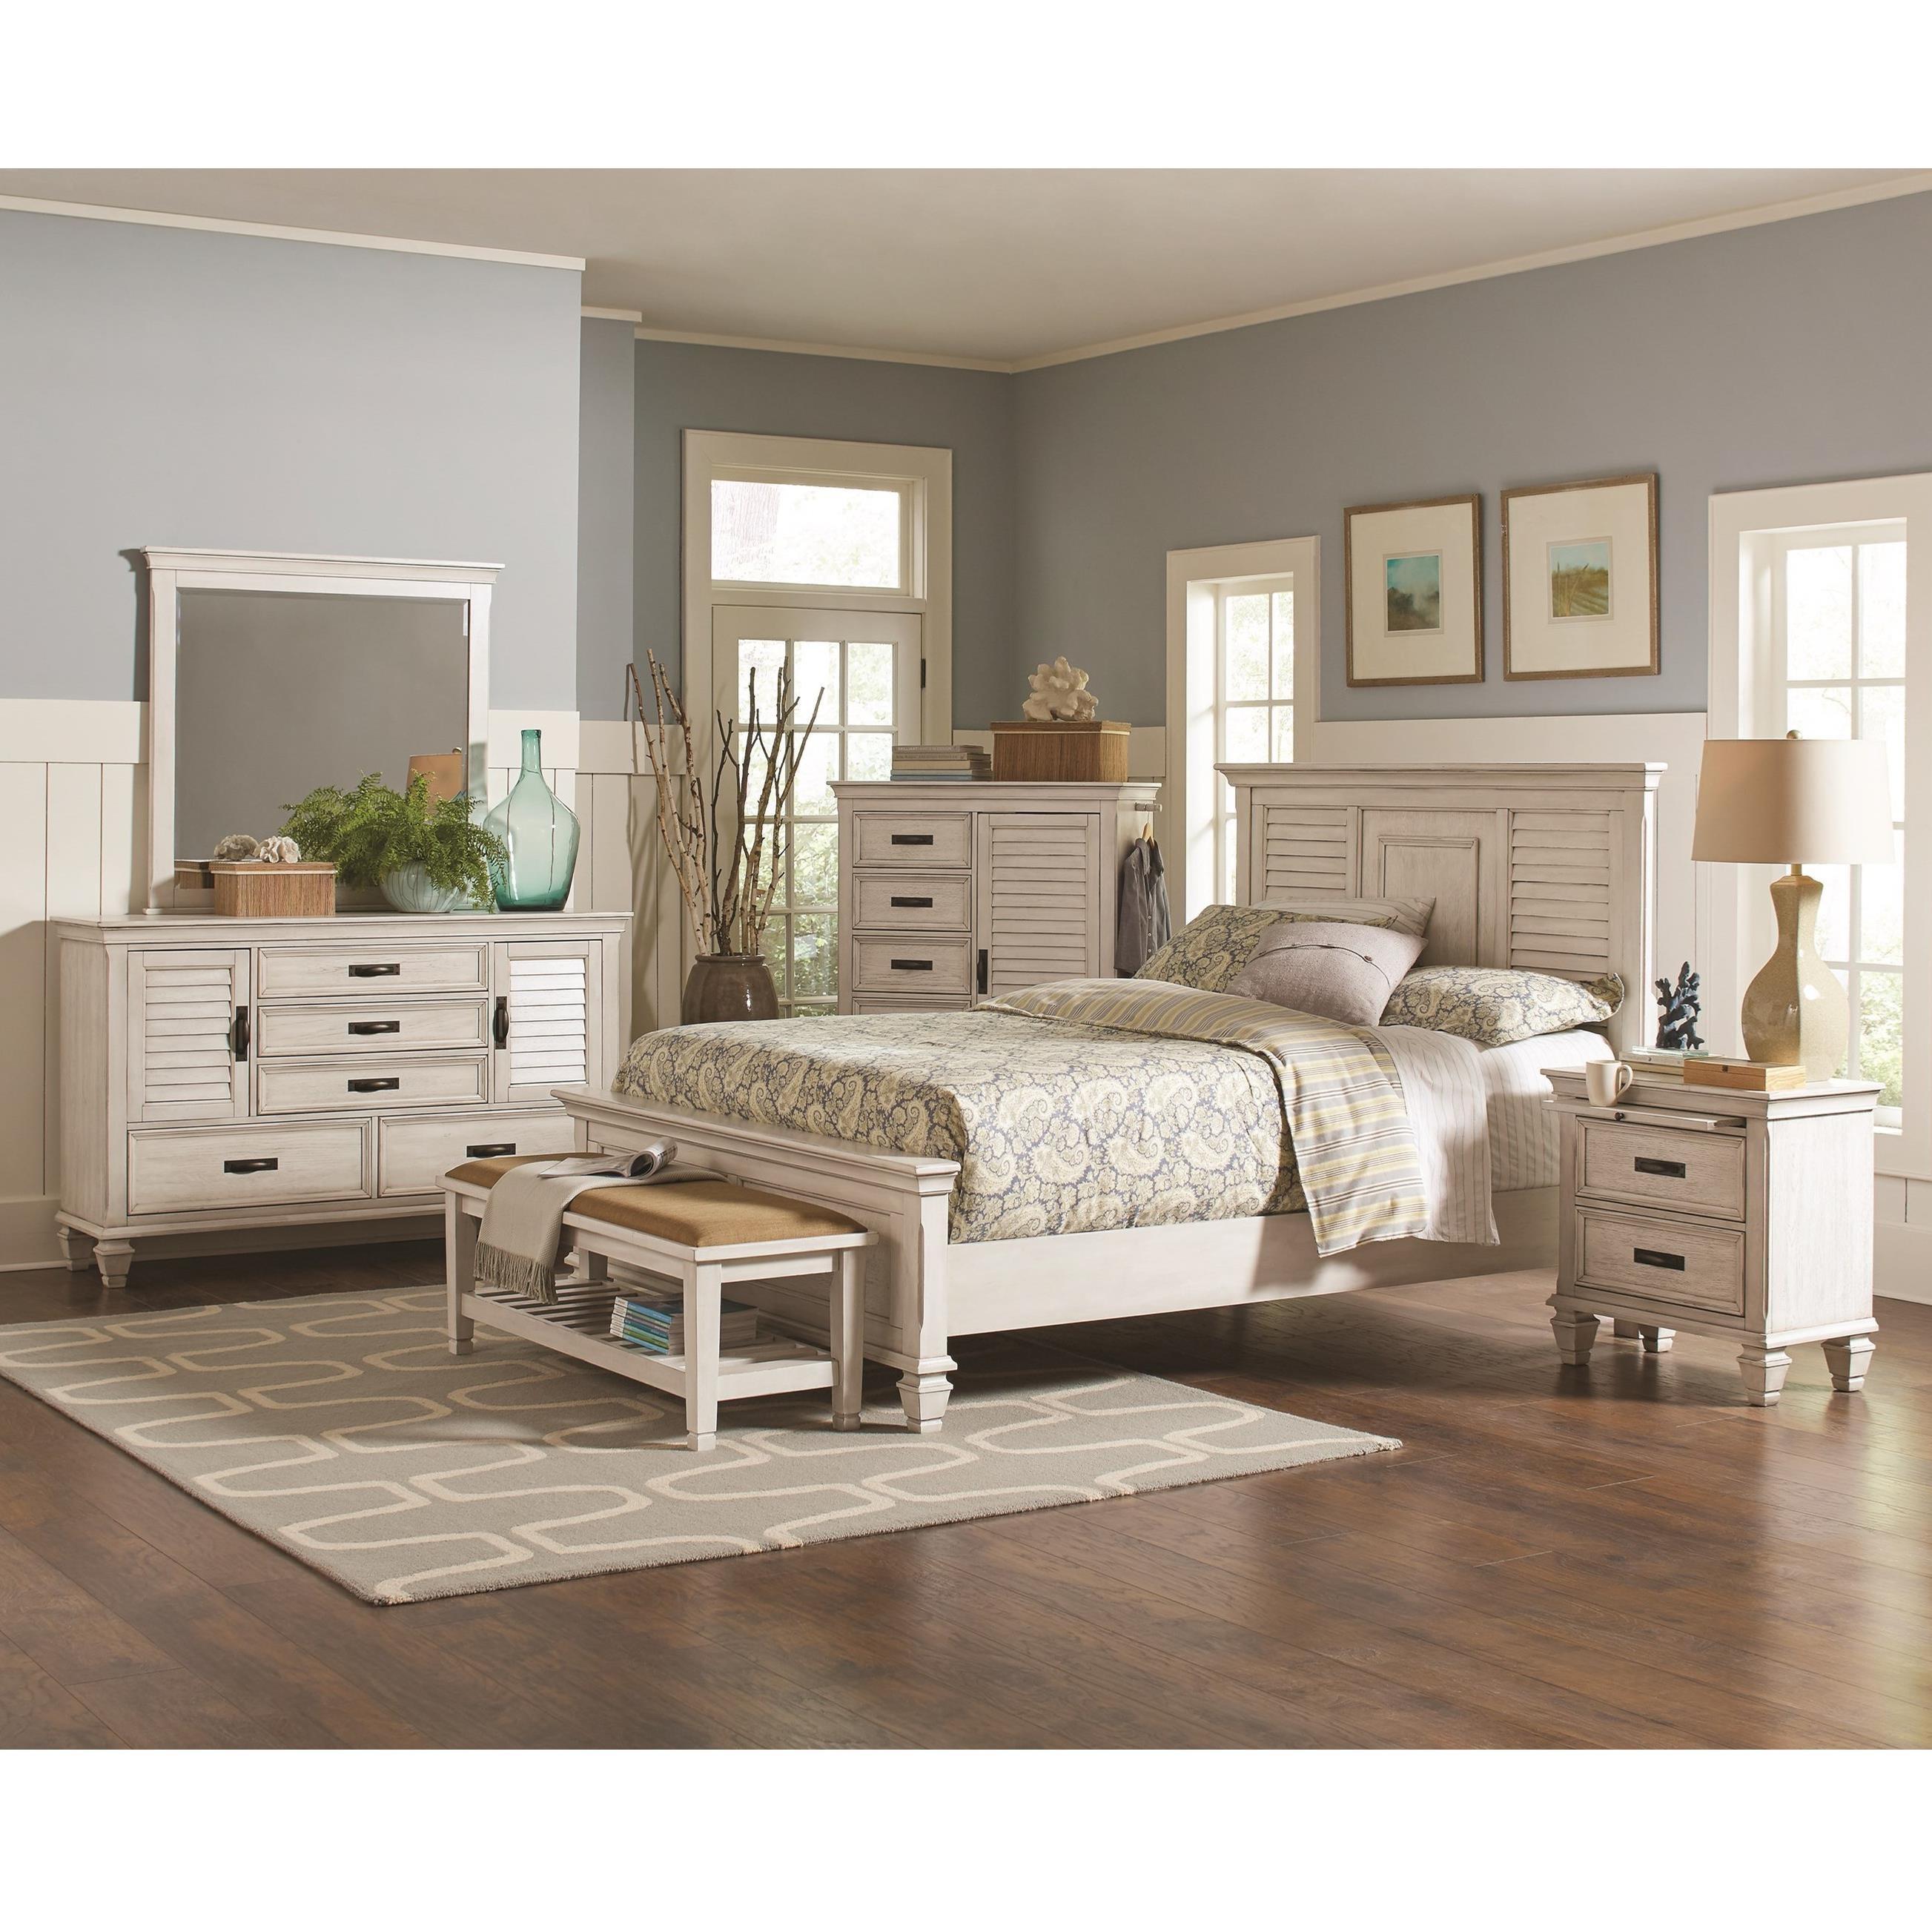 Coaster Franco Queen Bedroom Group - Item Number: 20533 Q Bedroom Group 1